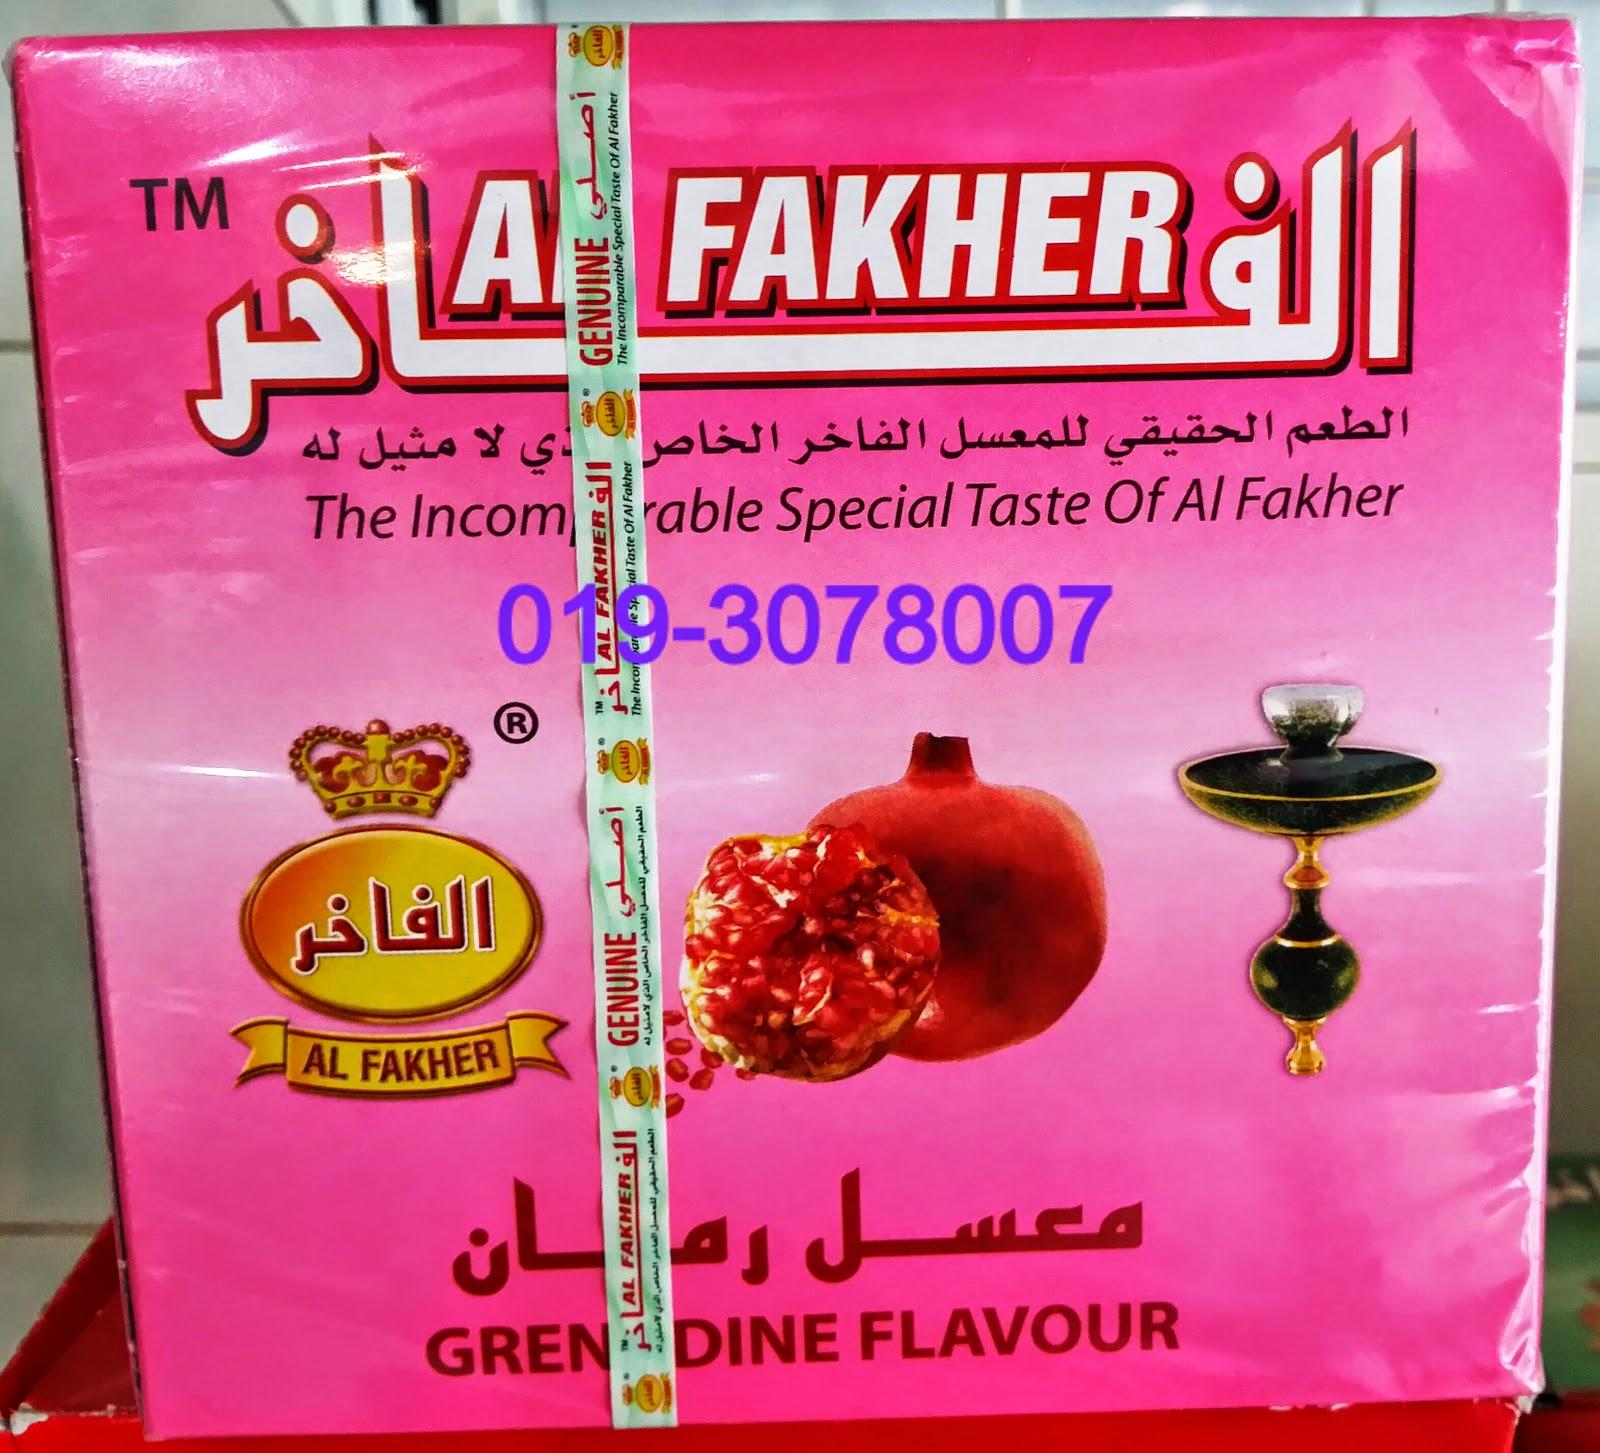 Pengimport Pembekal Pemborong Pengedar Flavor Shisha Al Fakher Dan Tembakau Melon Smooth Fresh Flavour Molasses Call Sms Whatsapp Viber